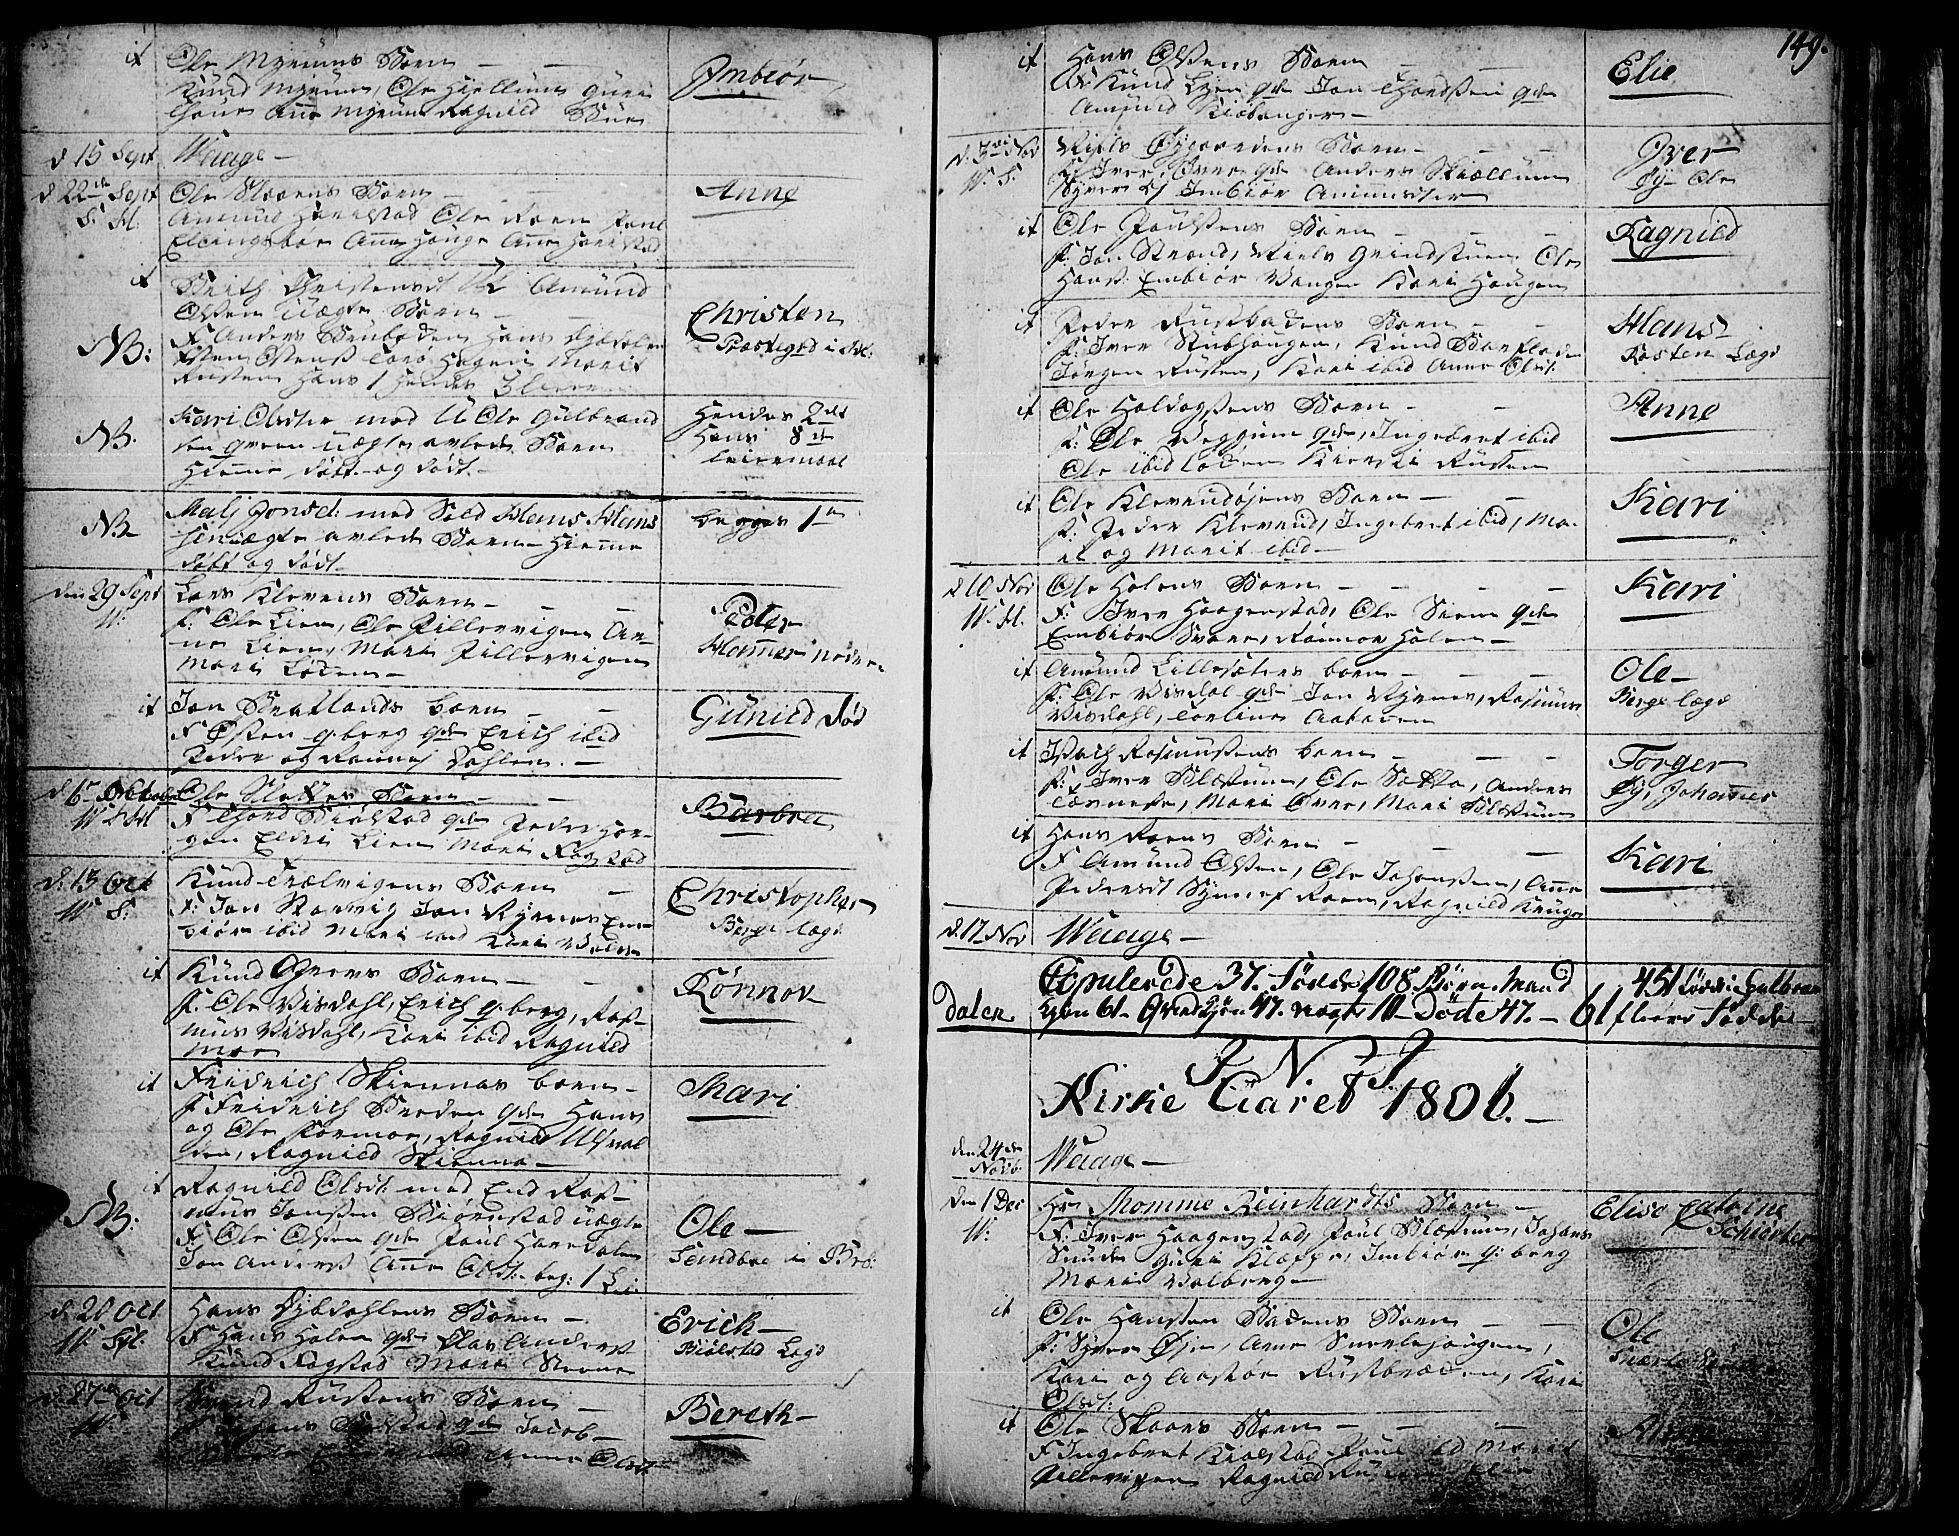 SAH, Vågå prestekontor, Ministerialbok nr. 1, 1739-1810, s. 149